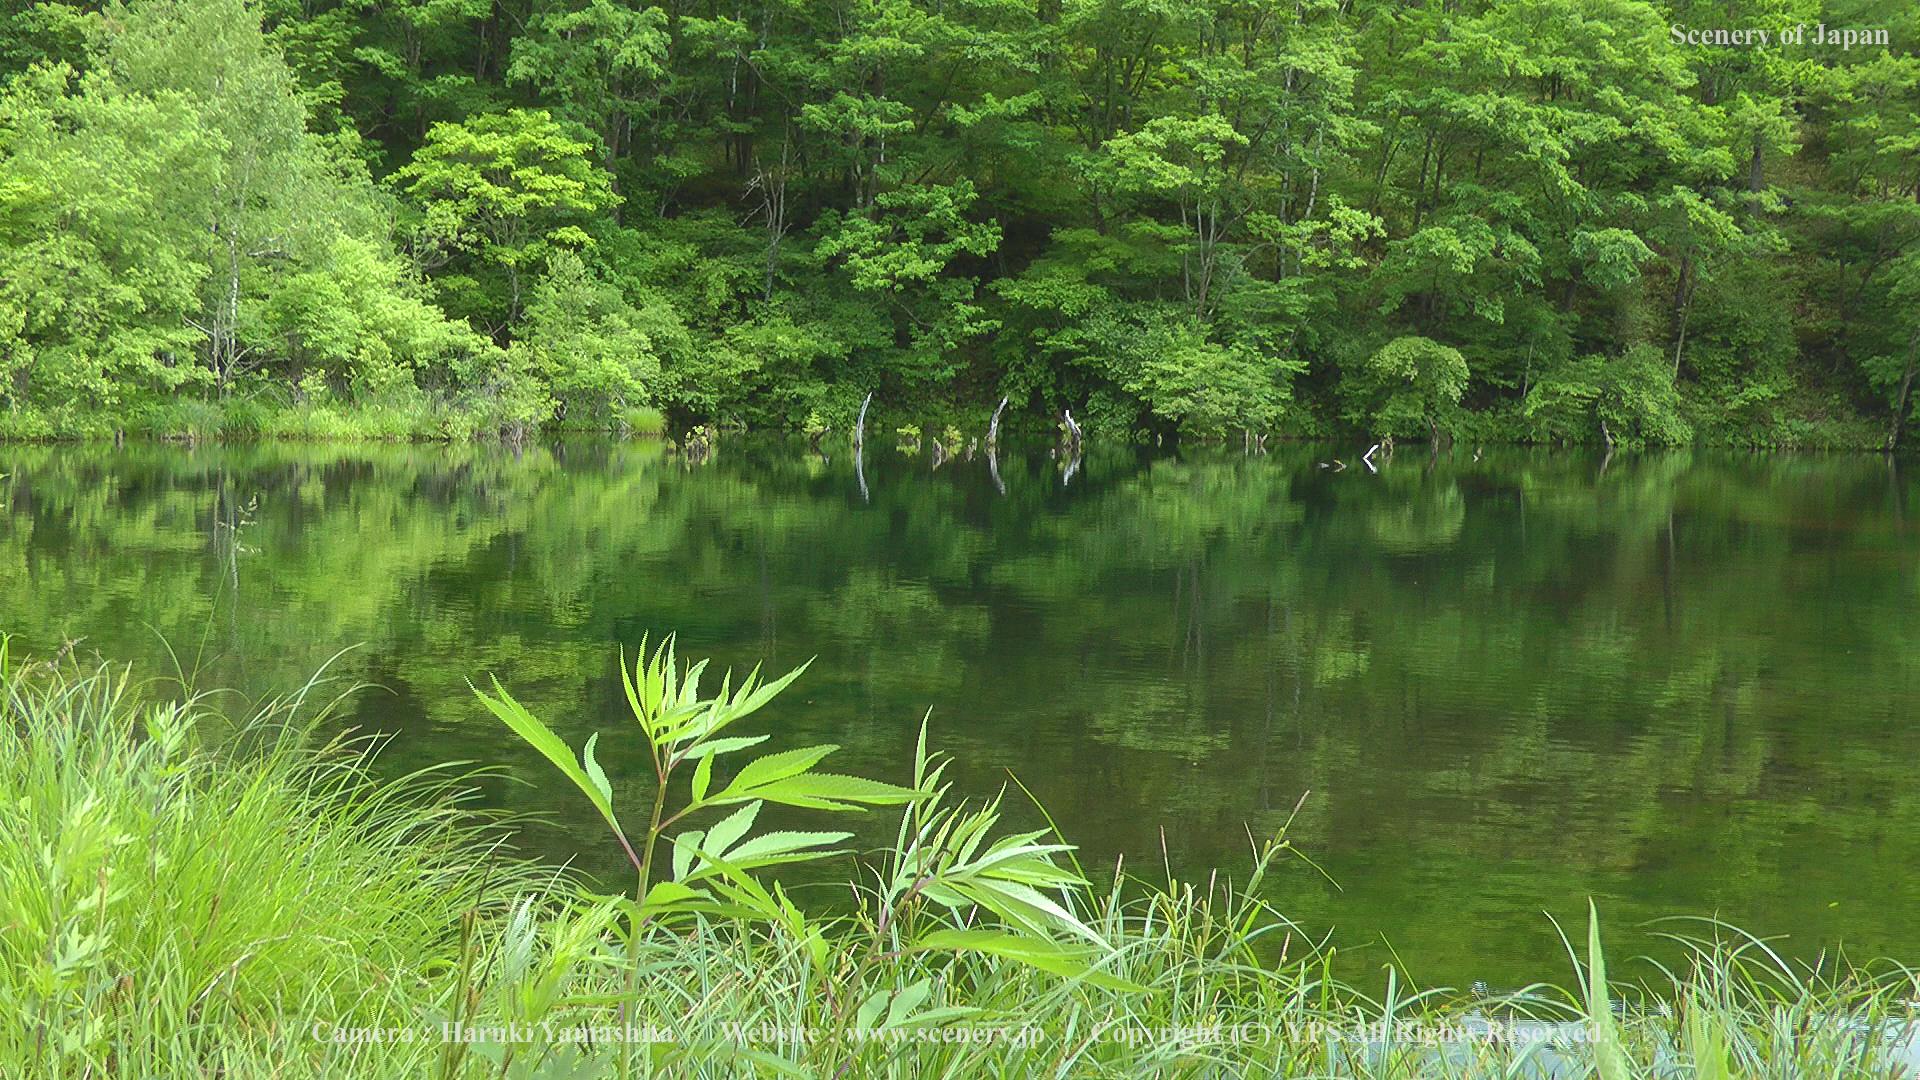 風景写真の無料壁紙 - 夏の画像 ...